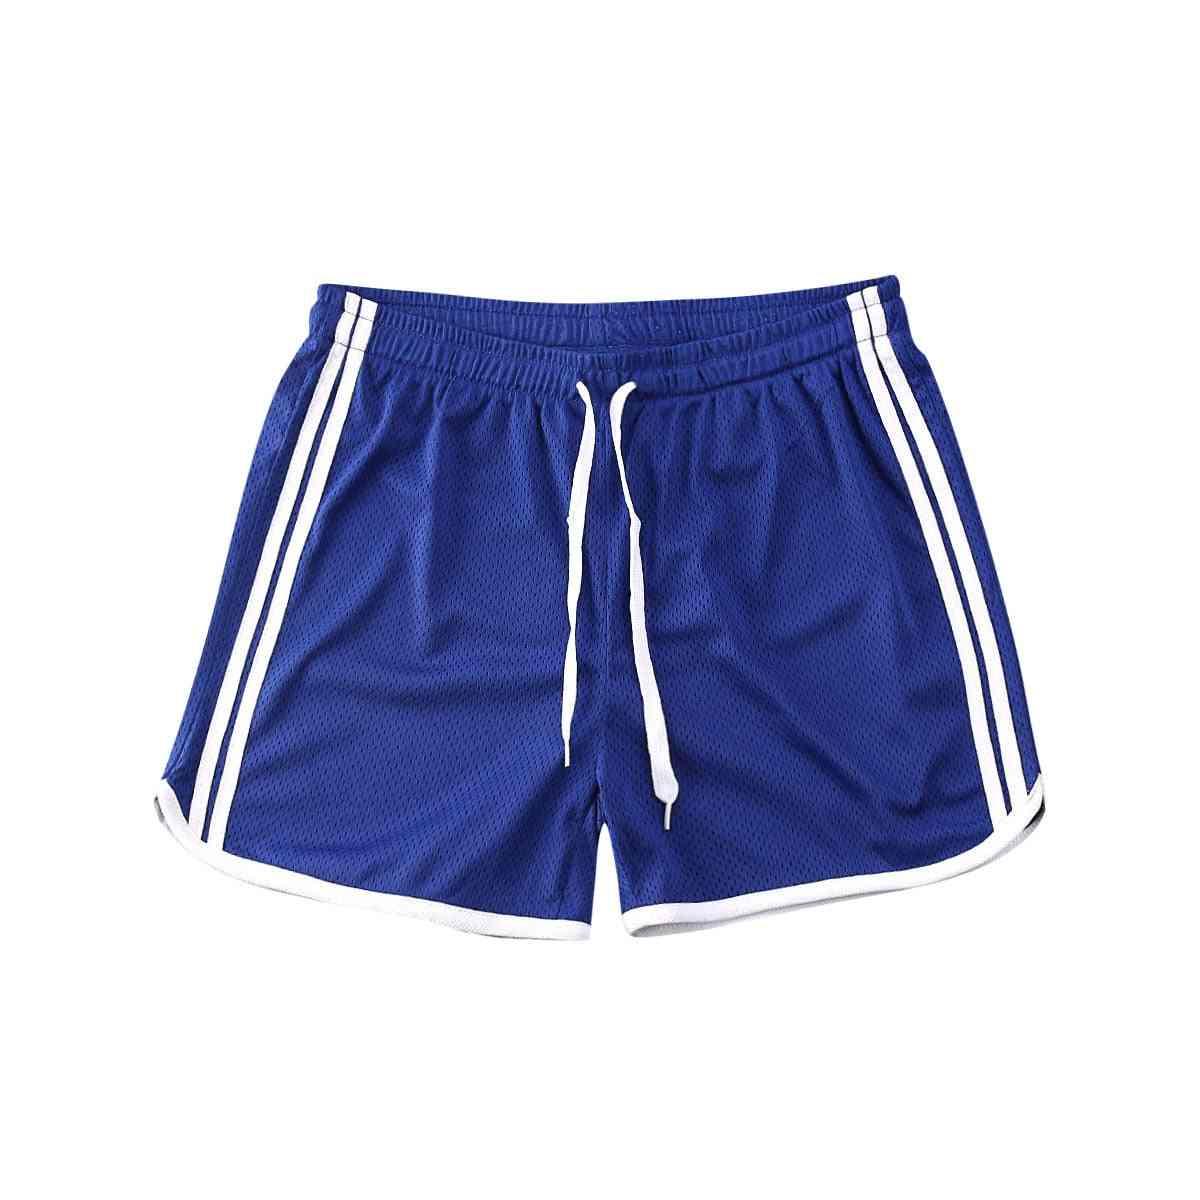 Men Summer Running Shorts- Men Fitness Soccer Sport Gyms Short Bottoms